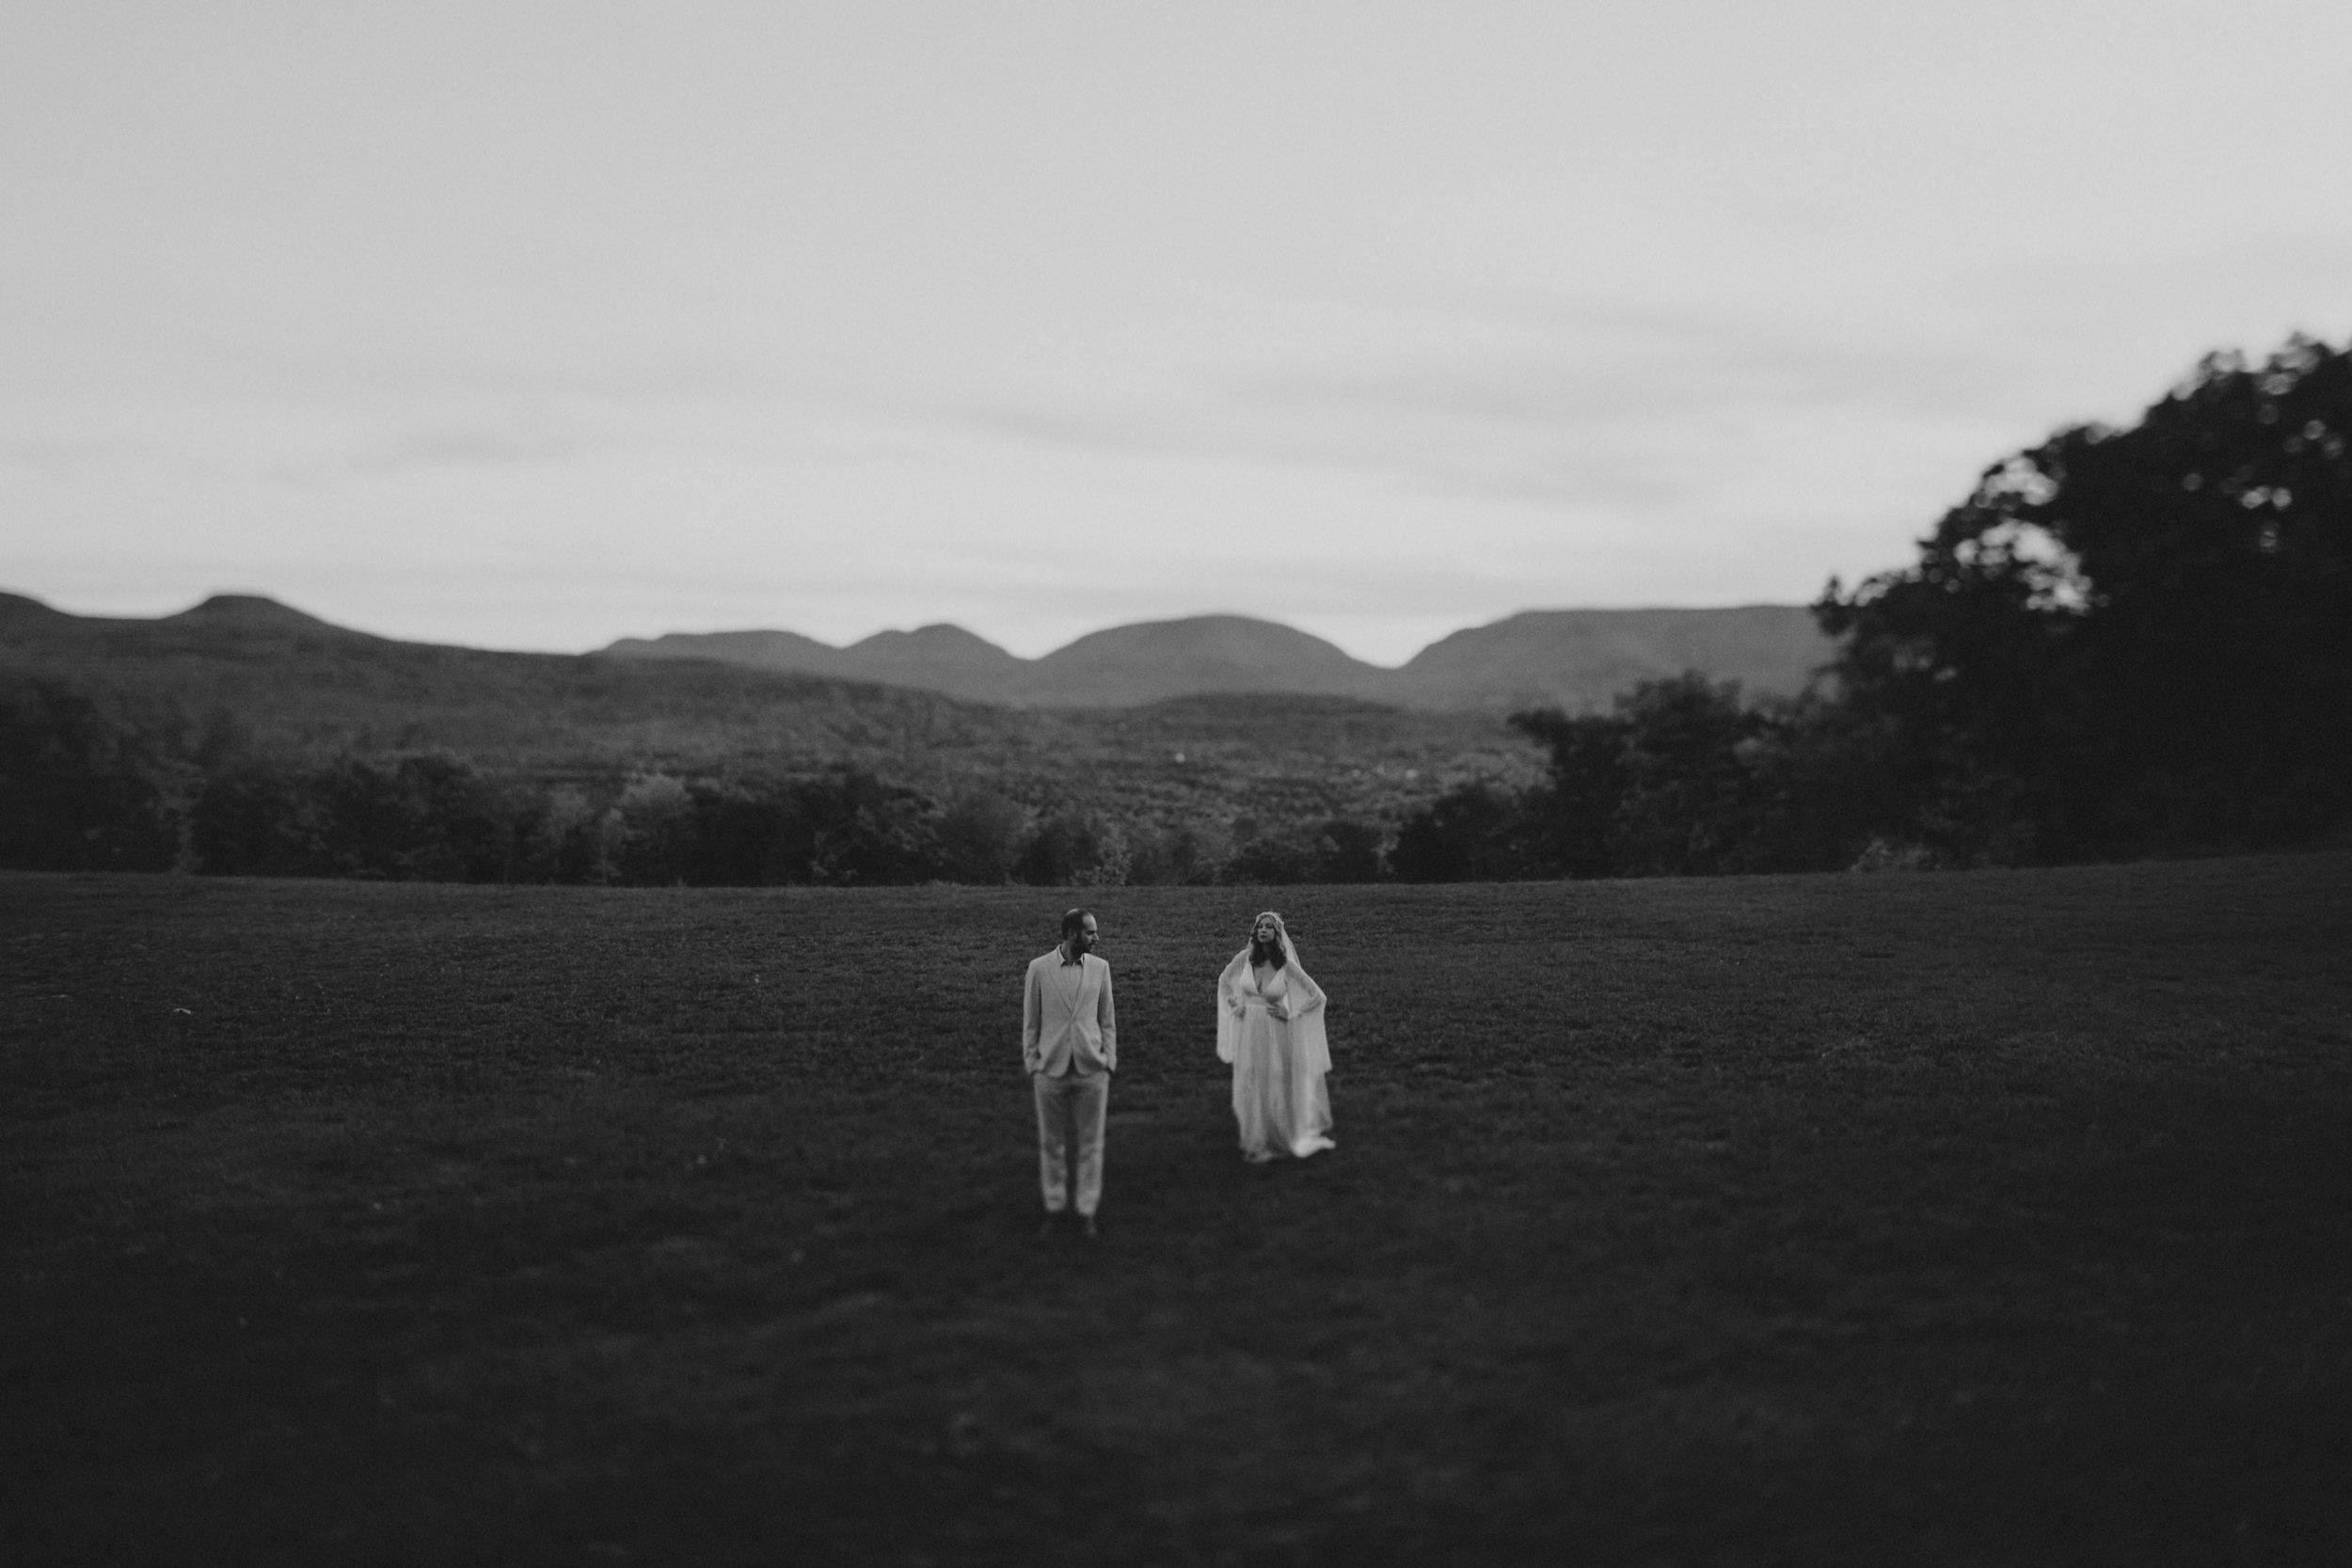 Deer_Mountain_Inn_Wedding_Chellise_Michael_Photography--106.jpg